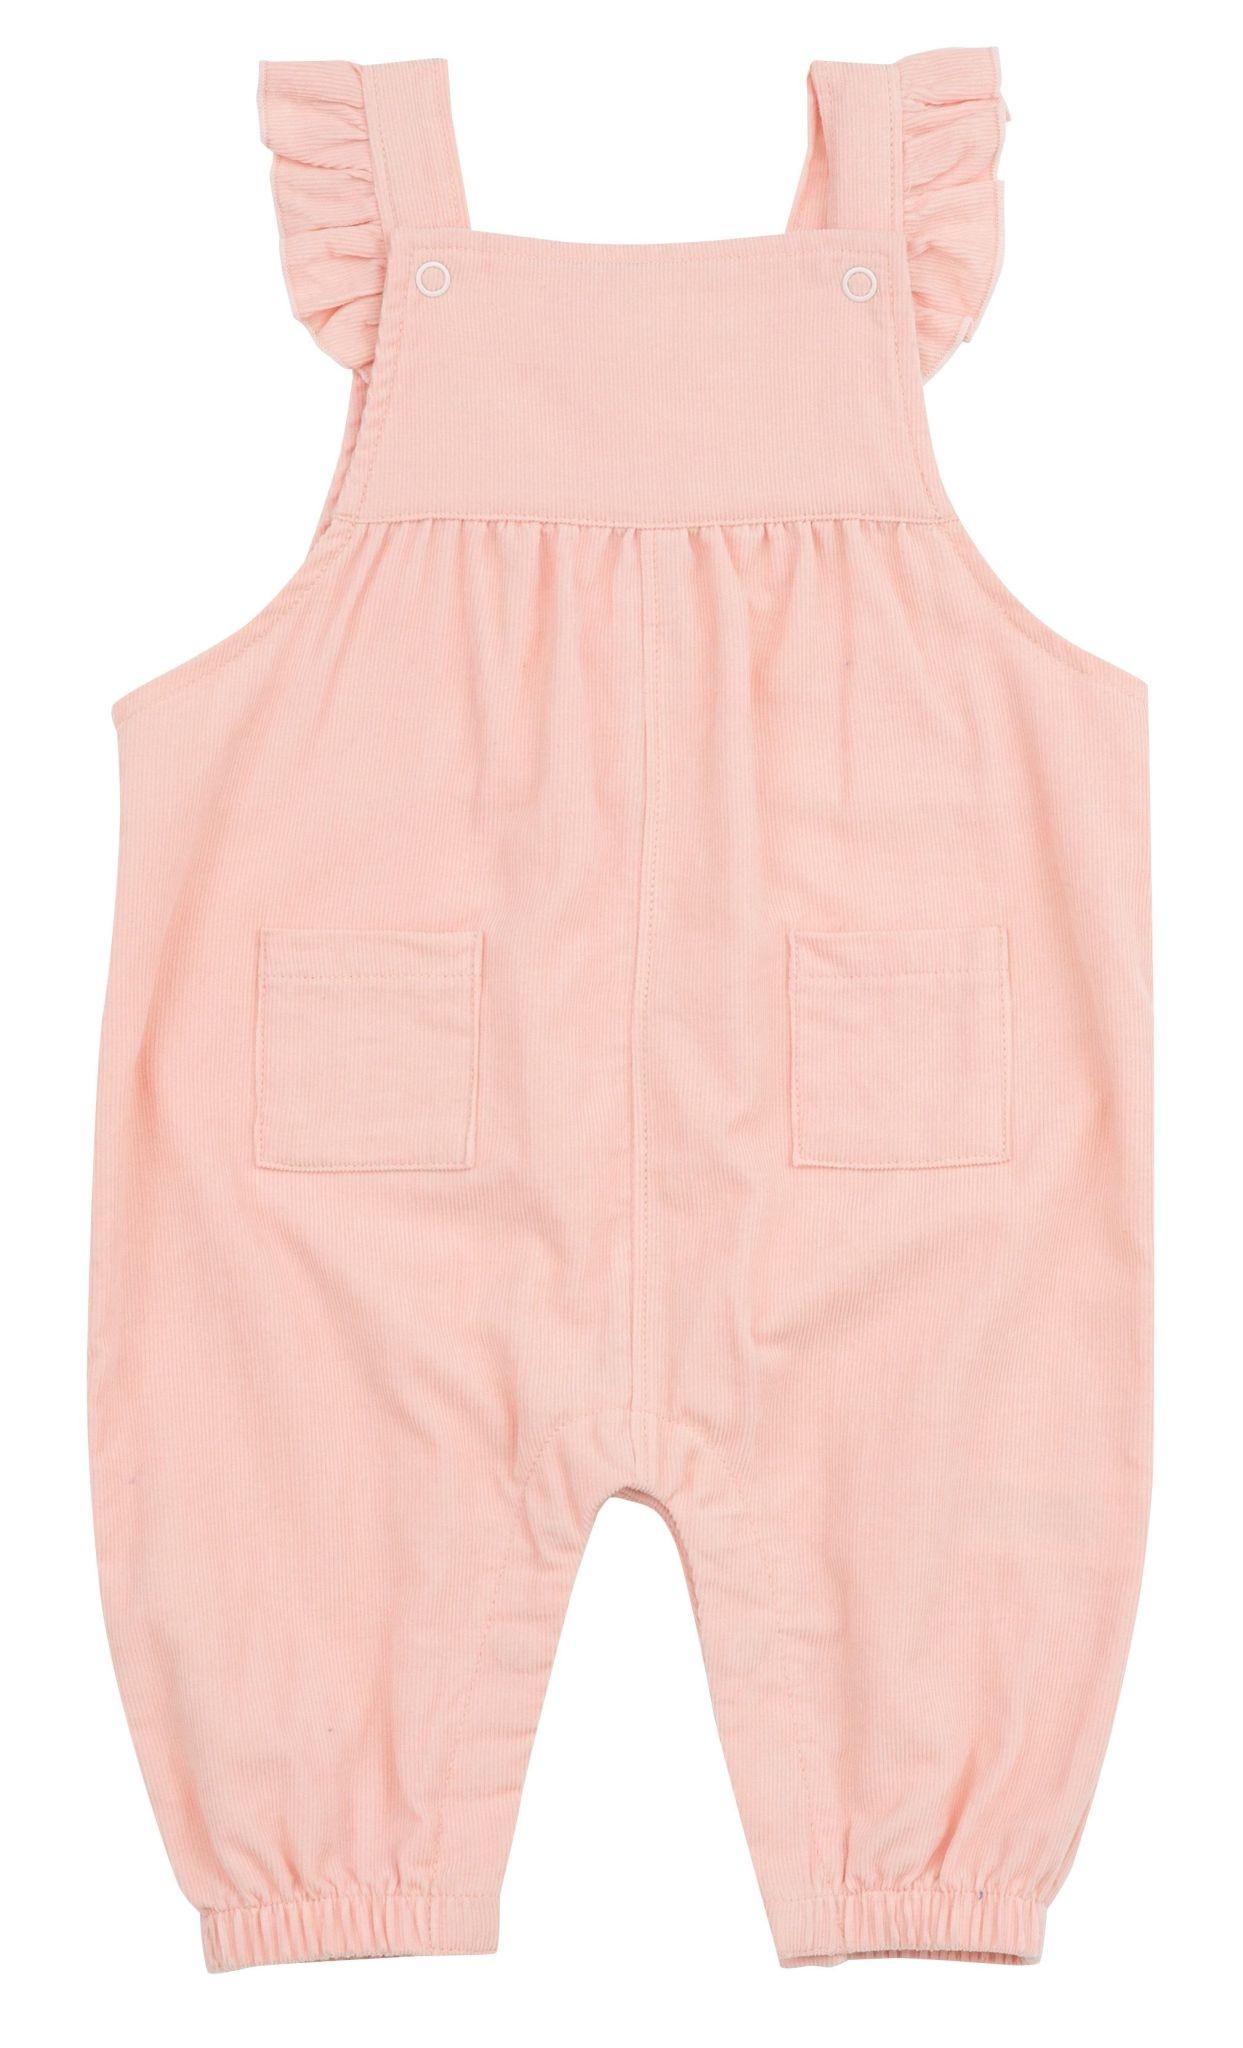 Angel Dear Pink Cord Ruffle Overalls